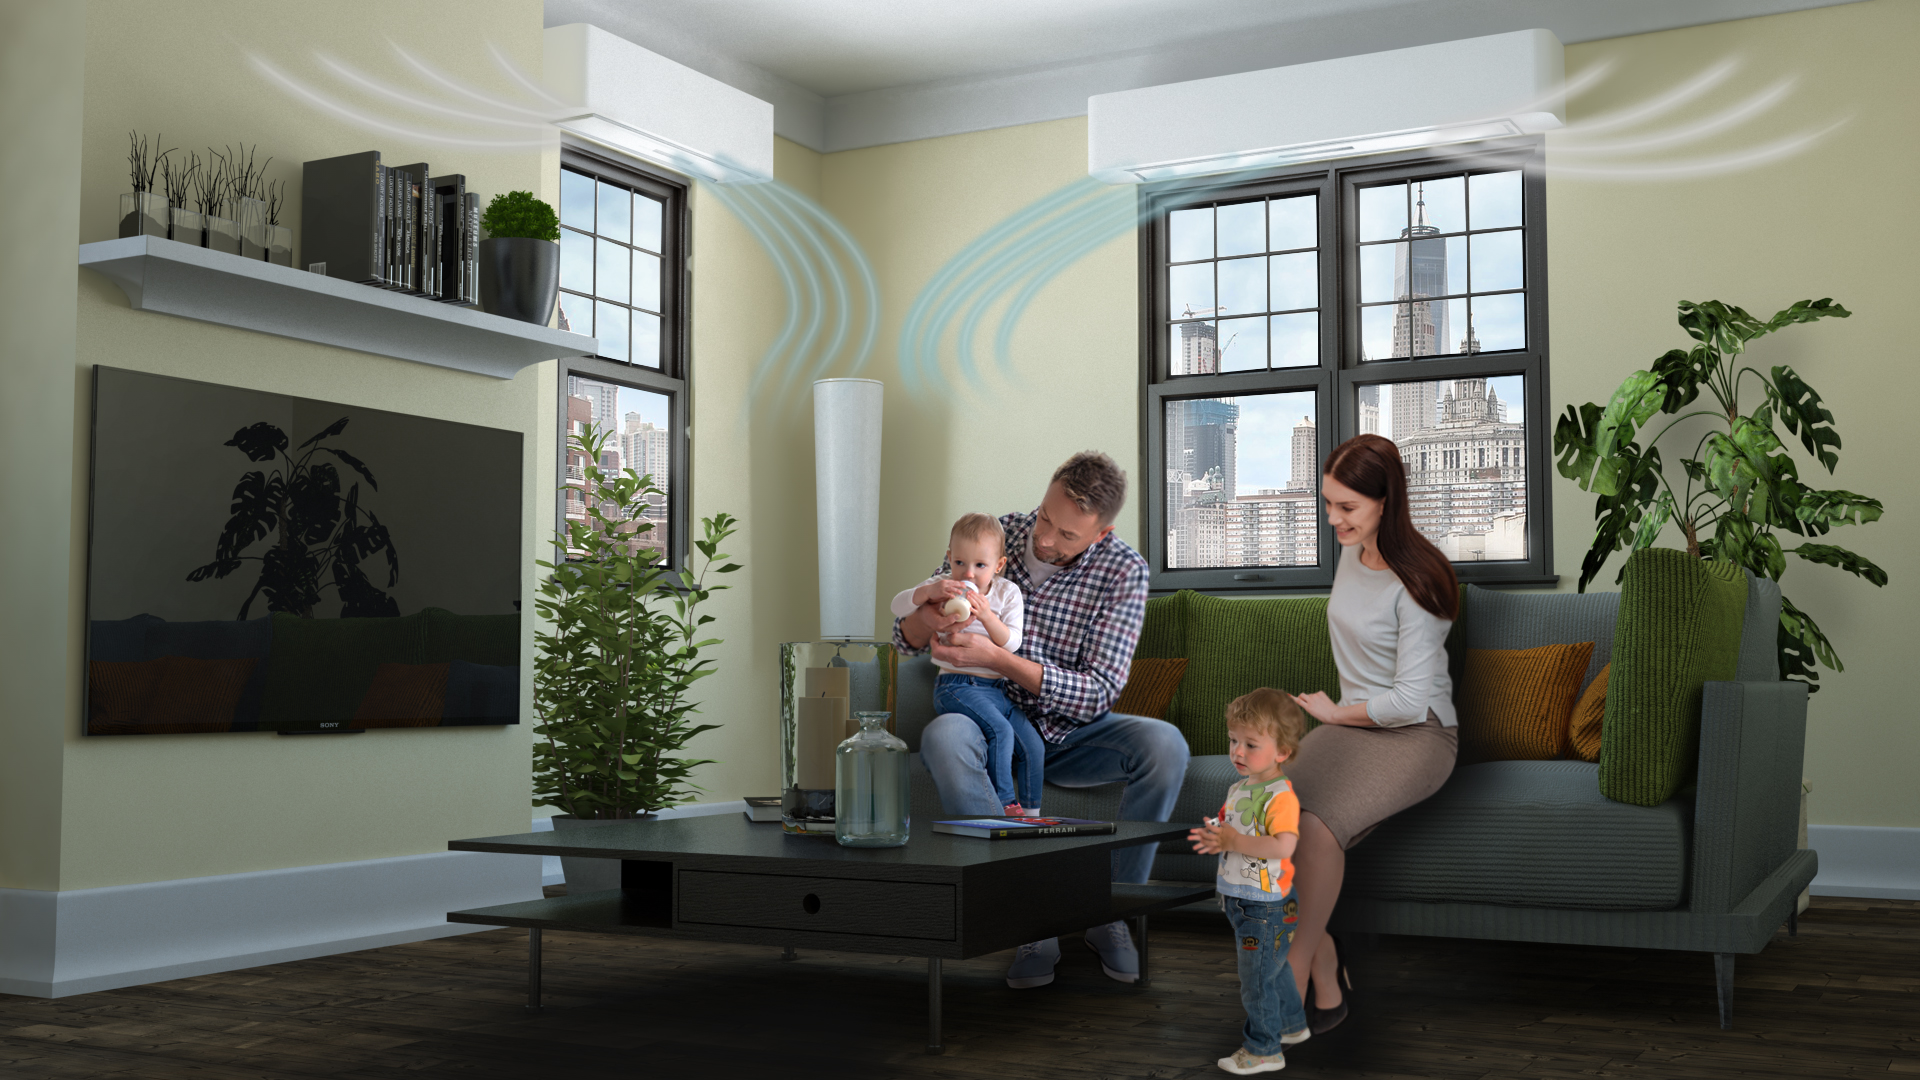 TopShut Air cassonetto tapparelle innovativo che purificatore aria